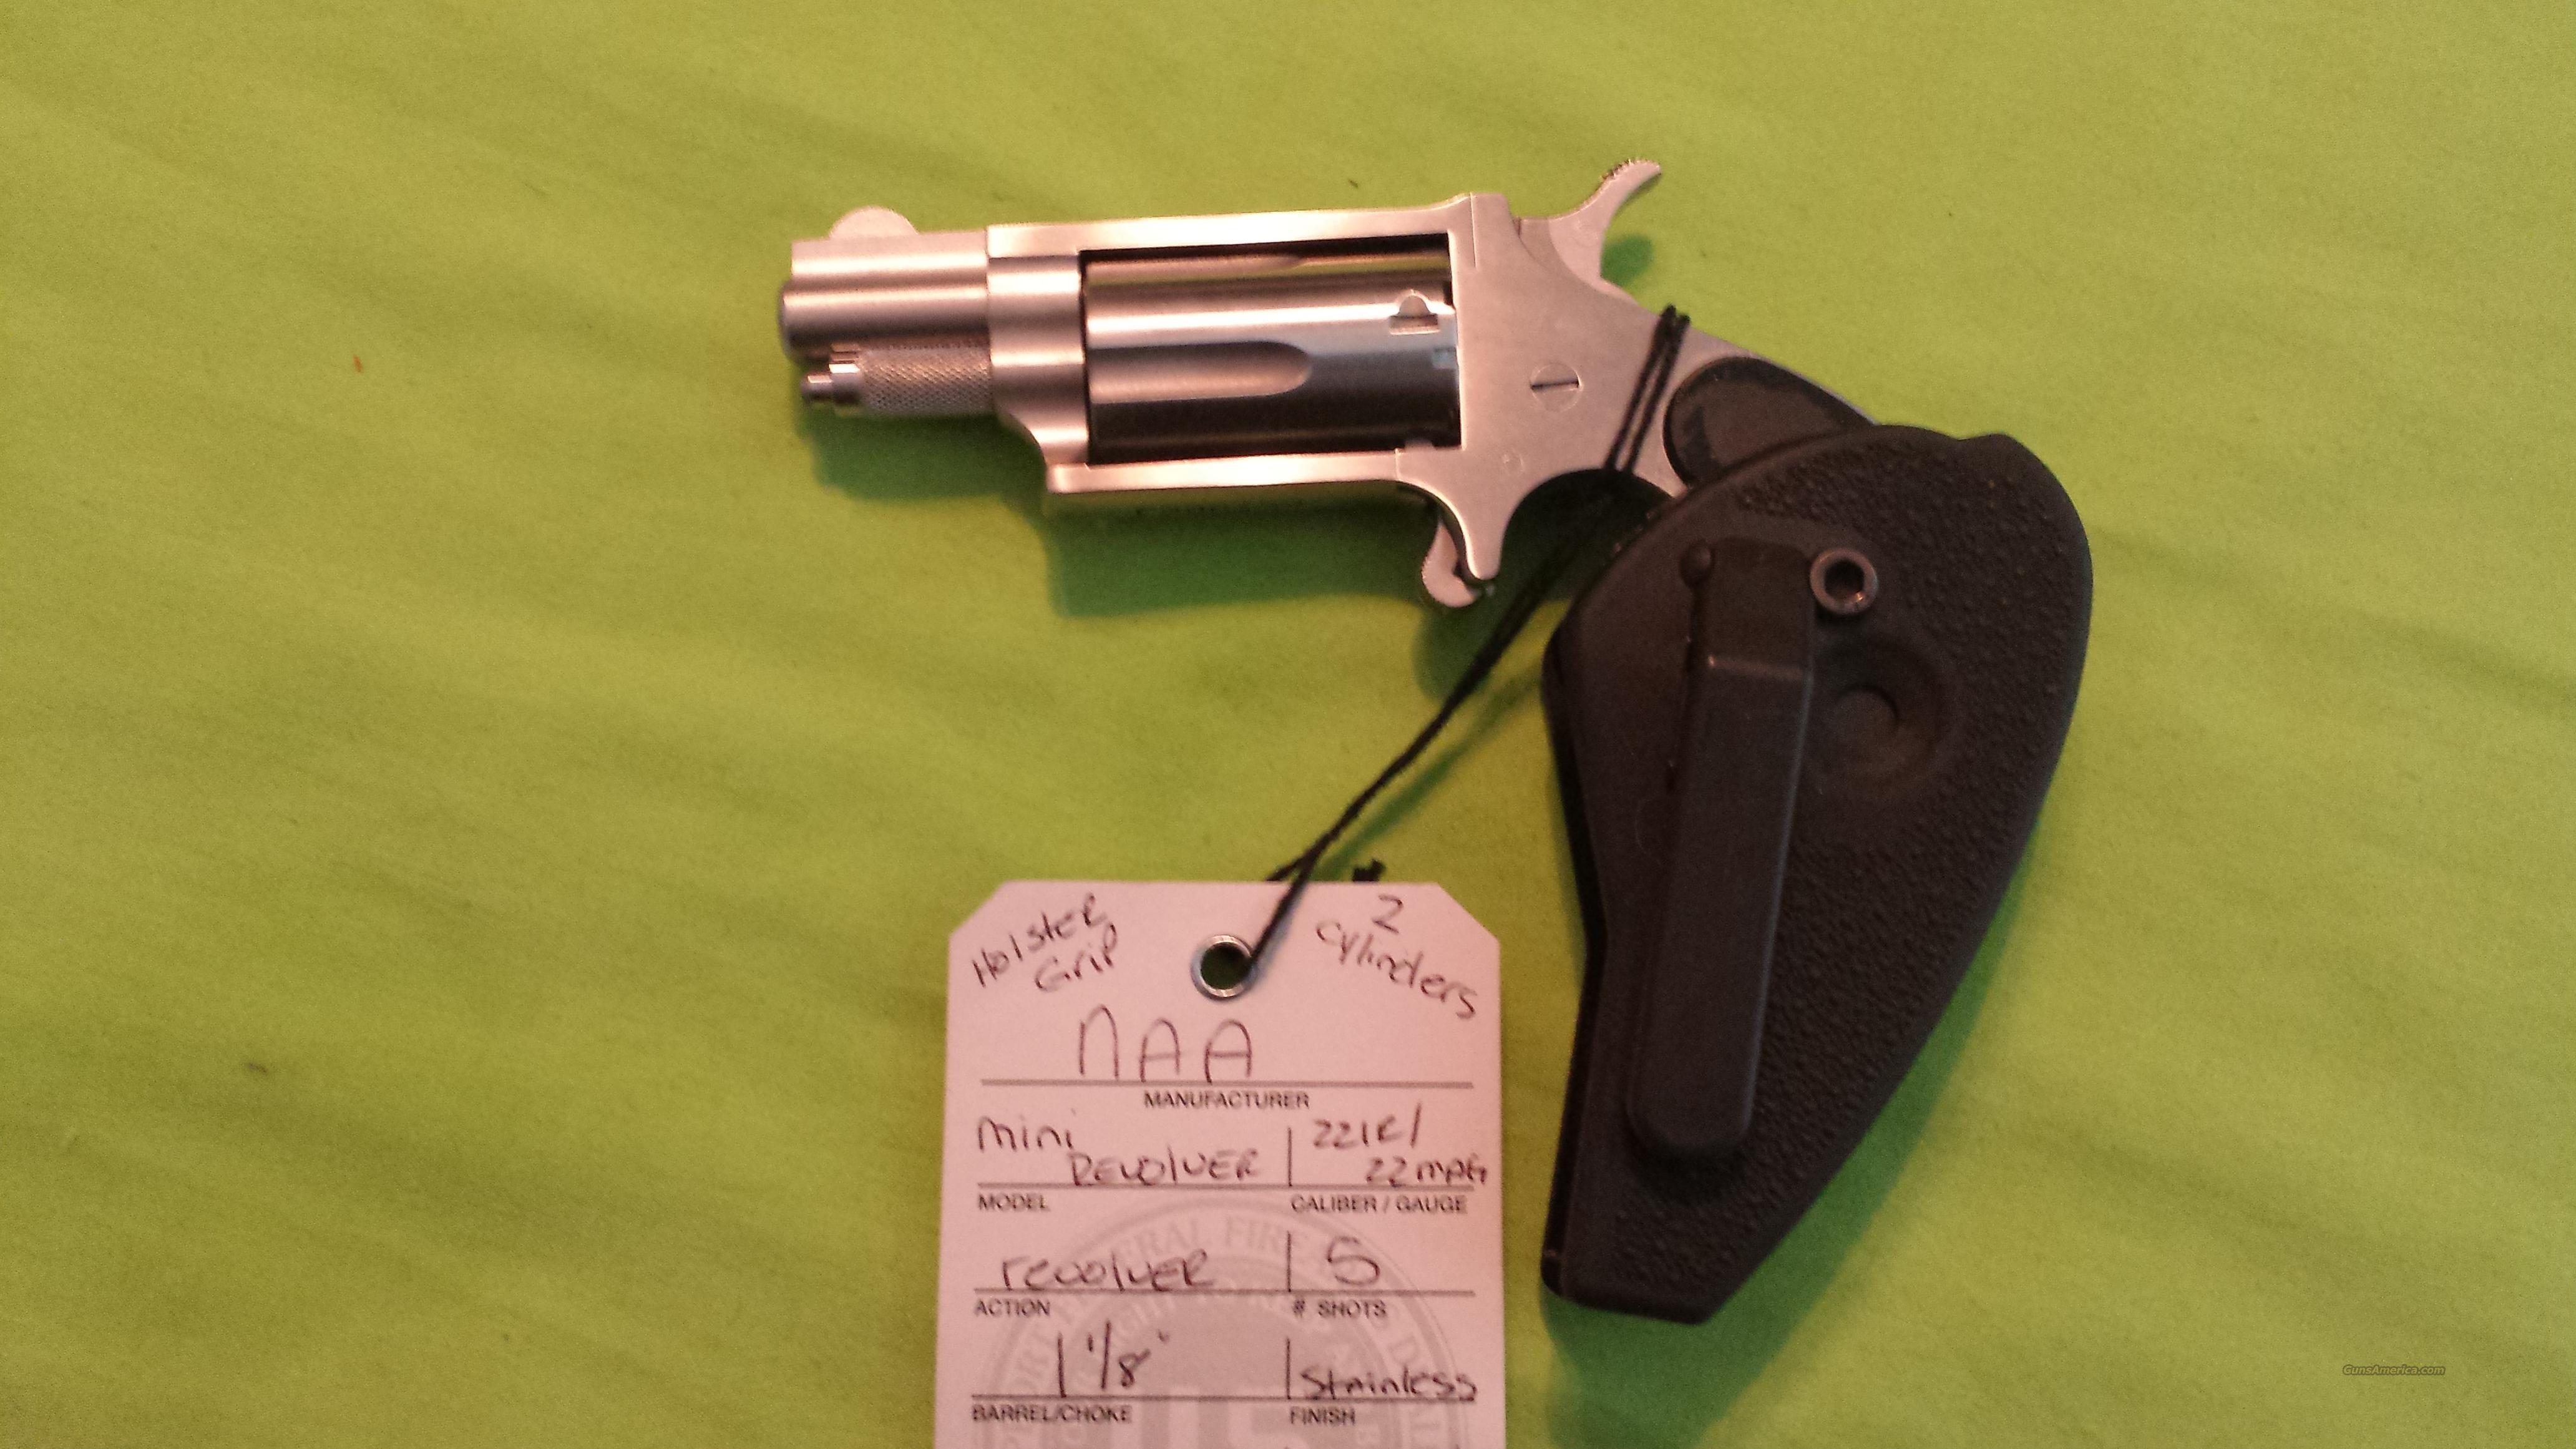 "NAA MINI REVOLVER 1 1/8"" 22 MAG 22 LR SS HG HOLSTER GRIP  Guns > Pistols > North American Arms Pistols"